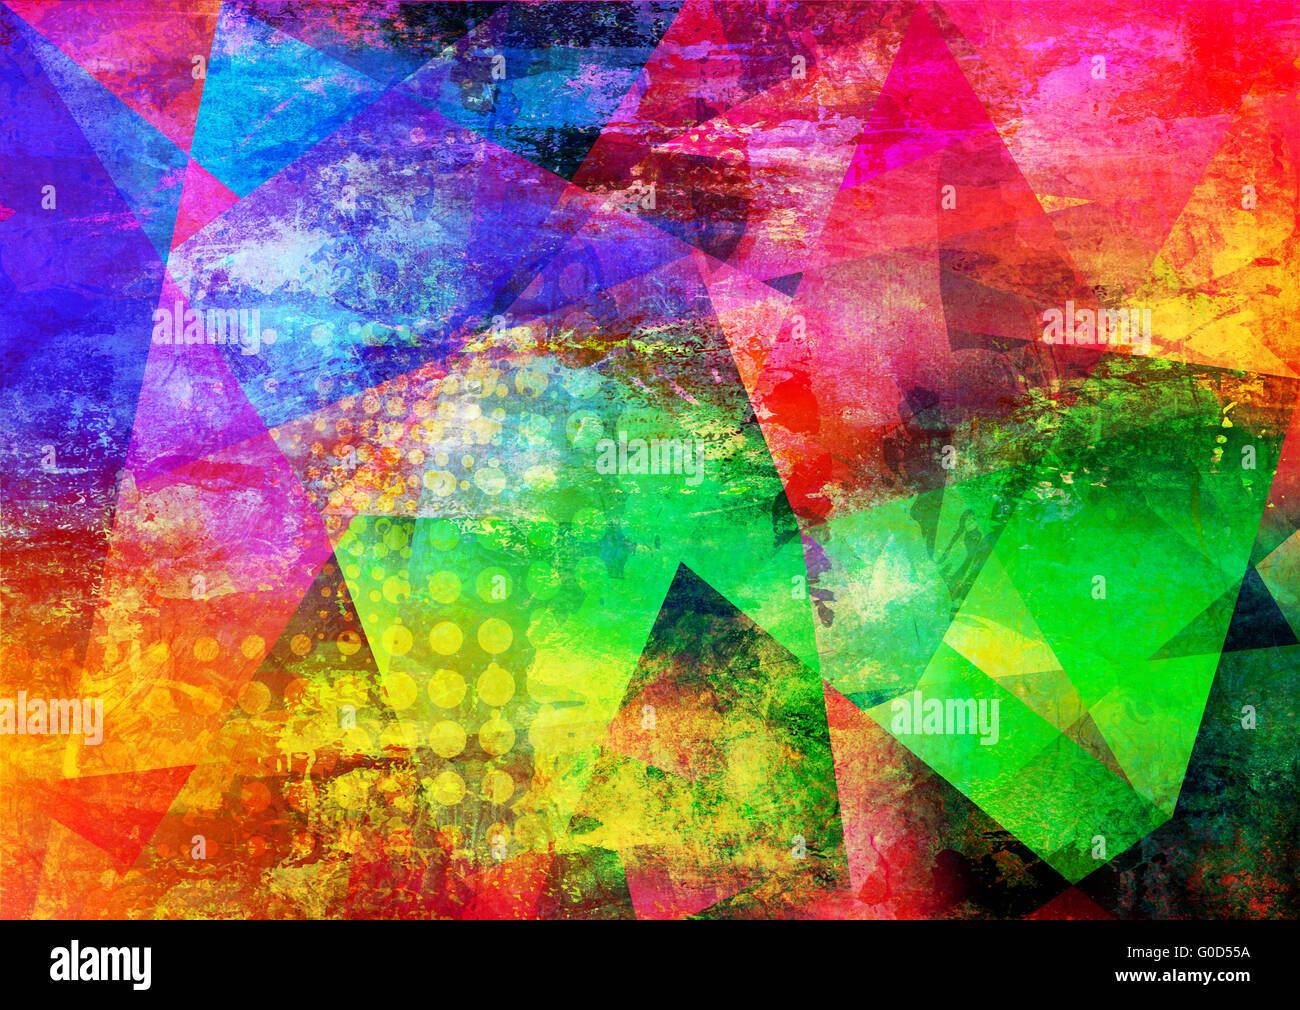 mixed media artwork - Stock Image